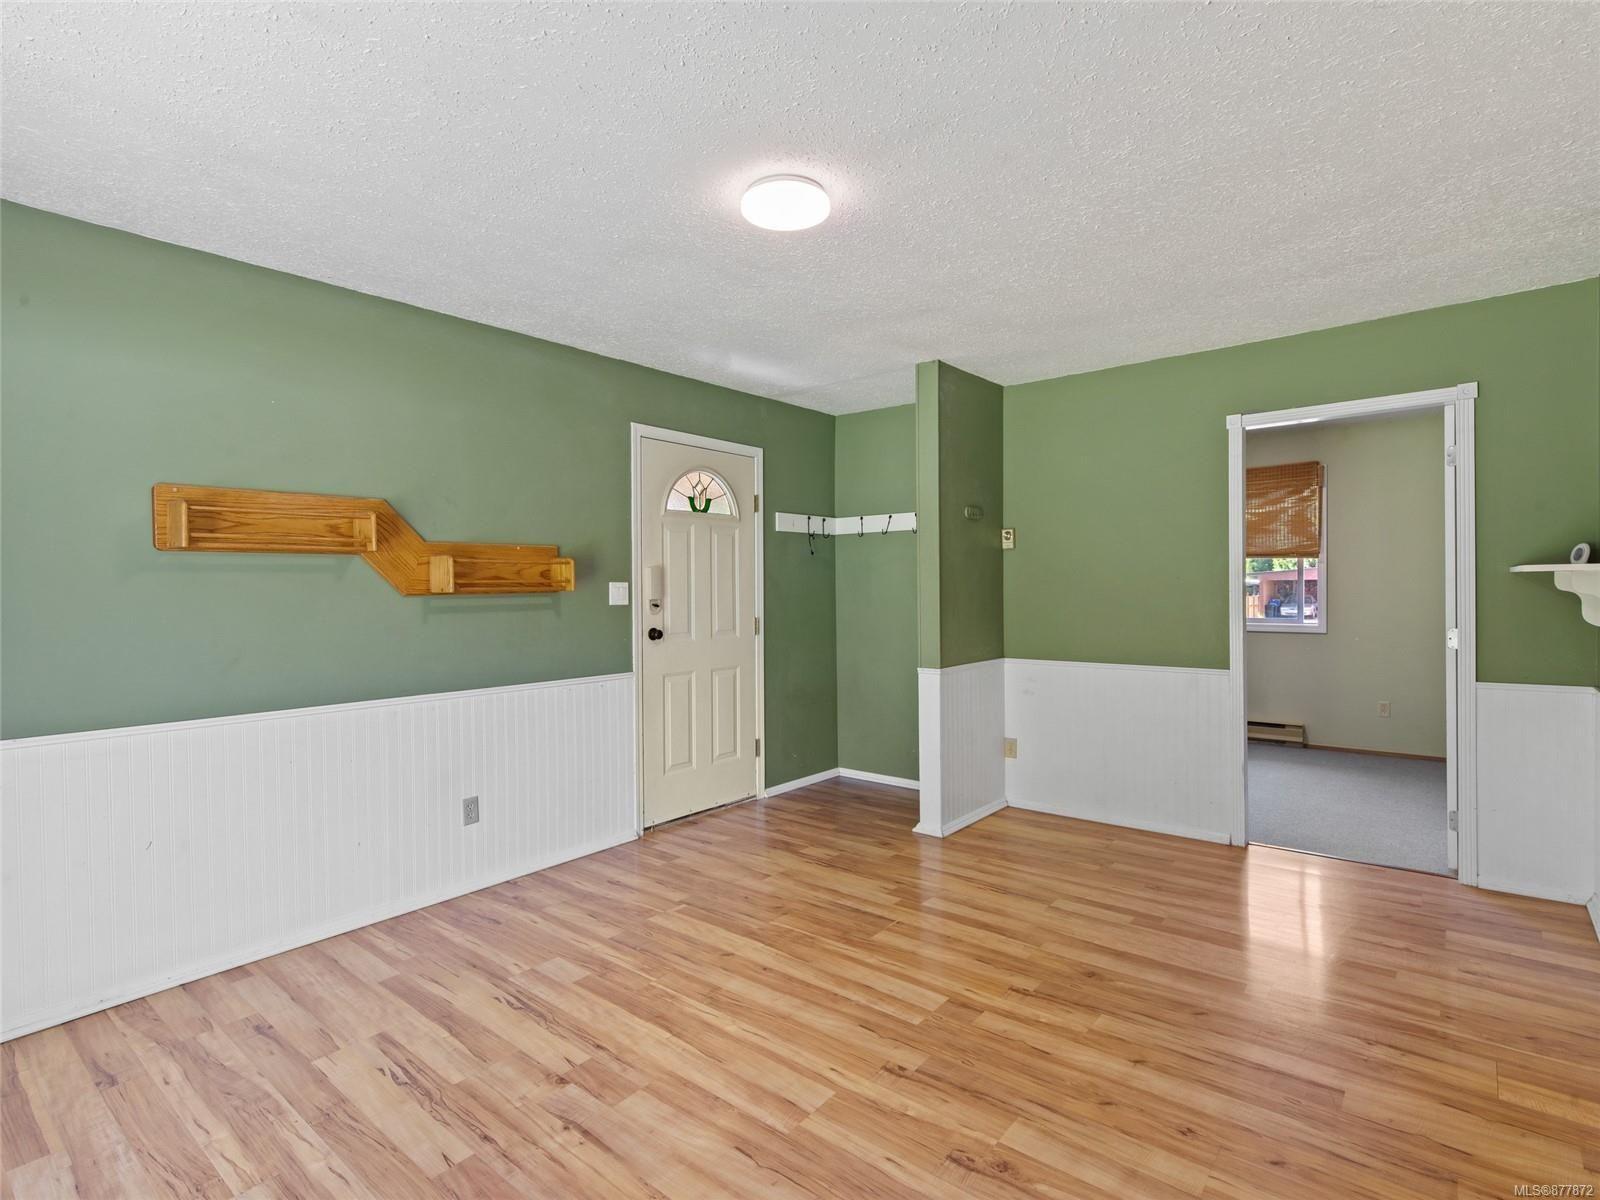 Photo 14: Photos: 7865 Wardrop Rd in : PA Port Alberni House for sale (Port Alberni)  : MLS®# 877872